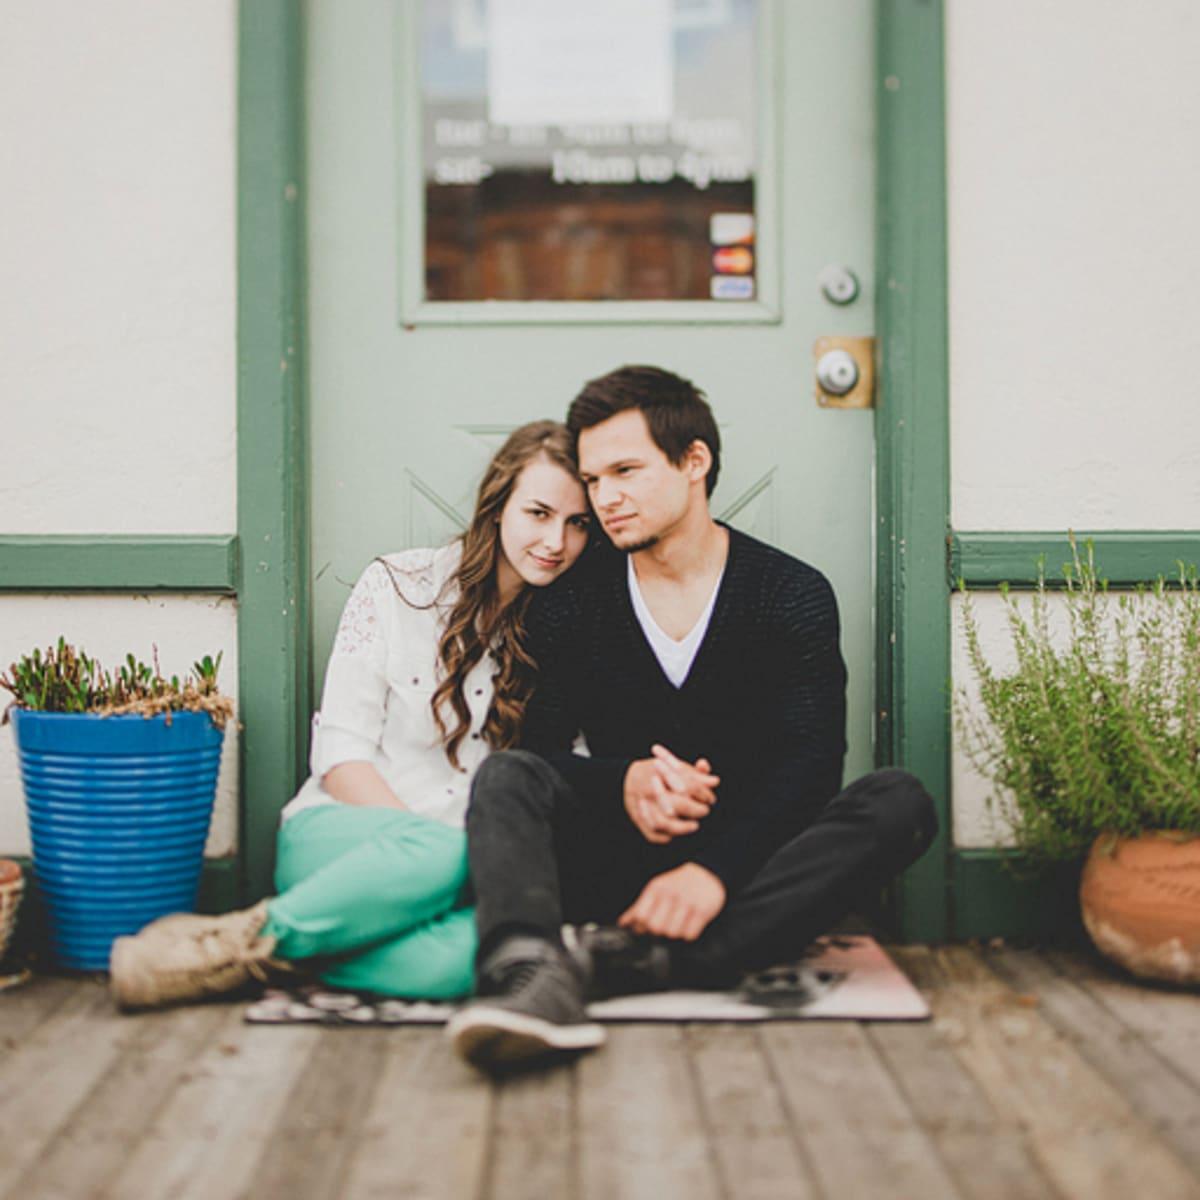 Dating ground dwarfism dating